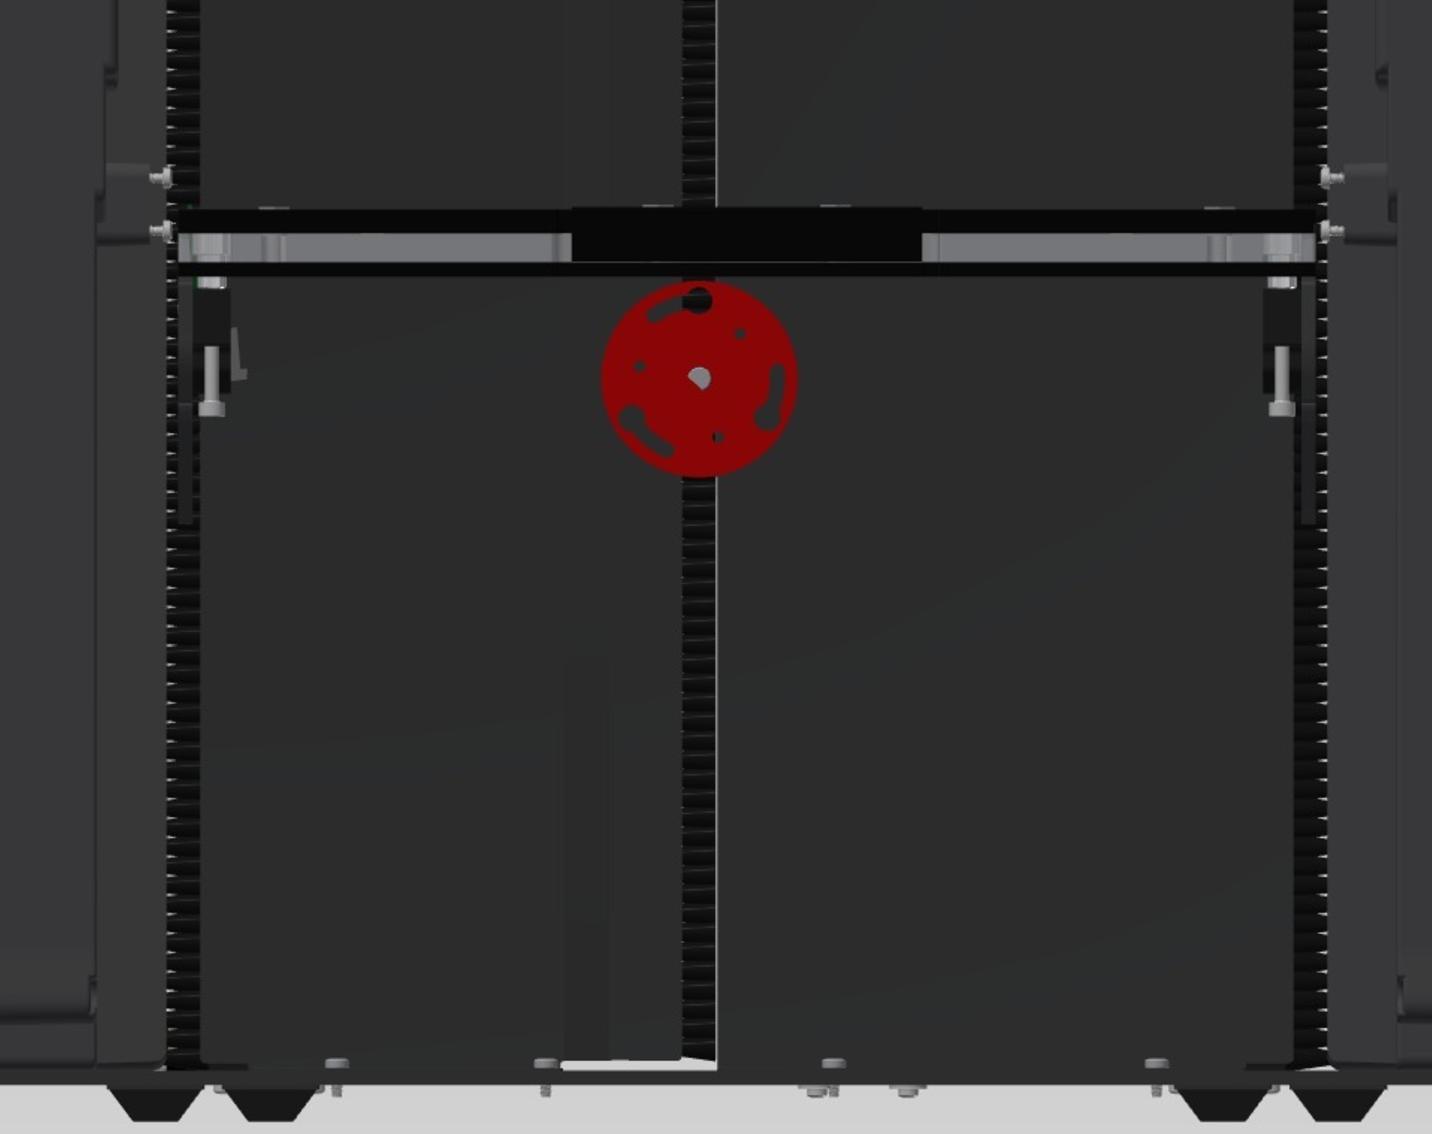 Capture d'écran 2017-01-31 à 18.23.01.png Download free STL file New FABtotum chuck for 4th axis • 3D print template, FABtotum